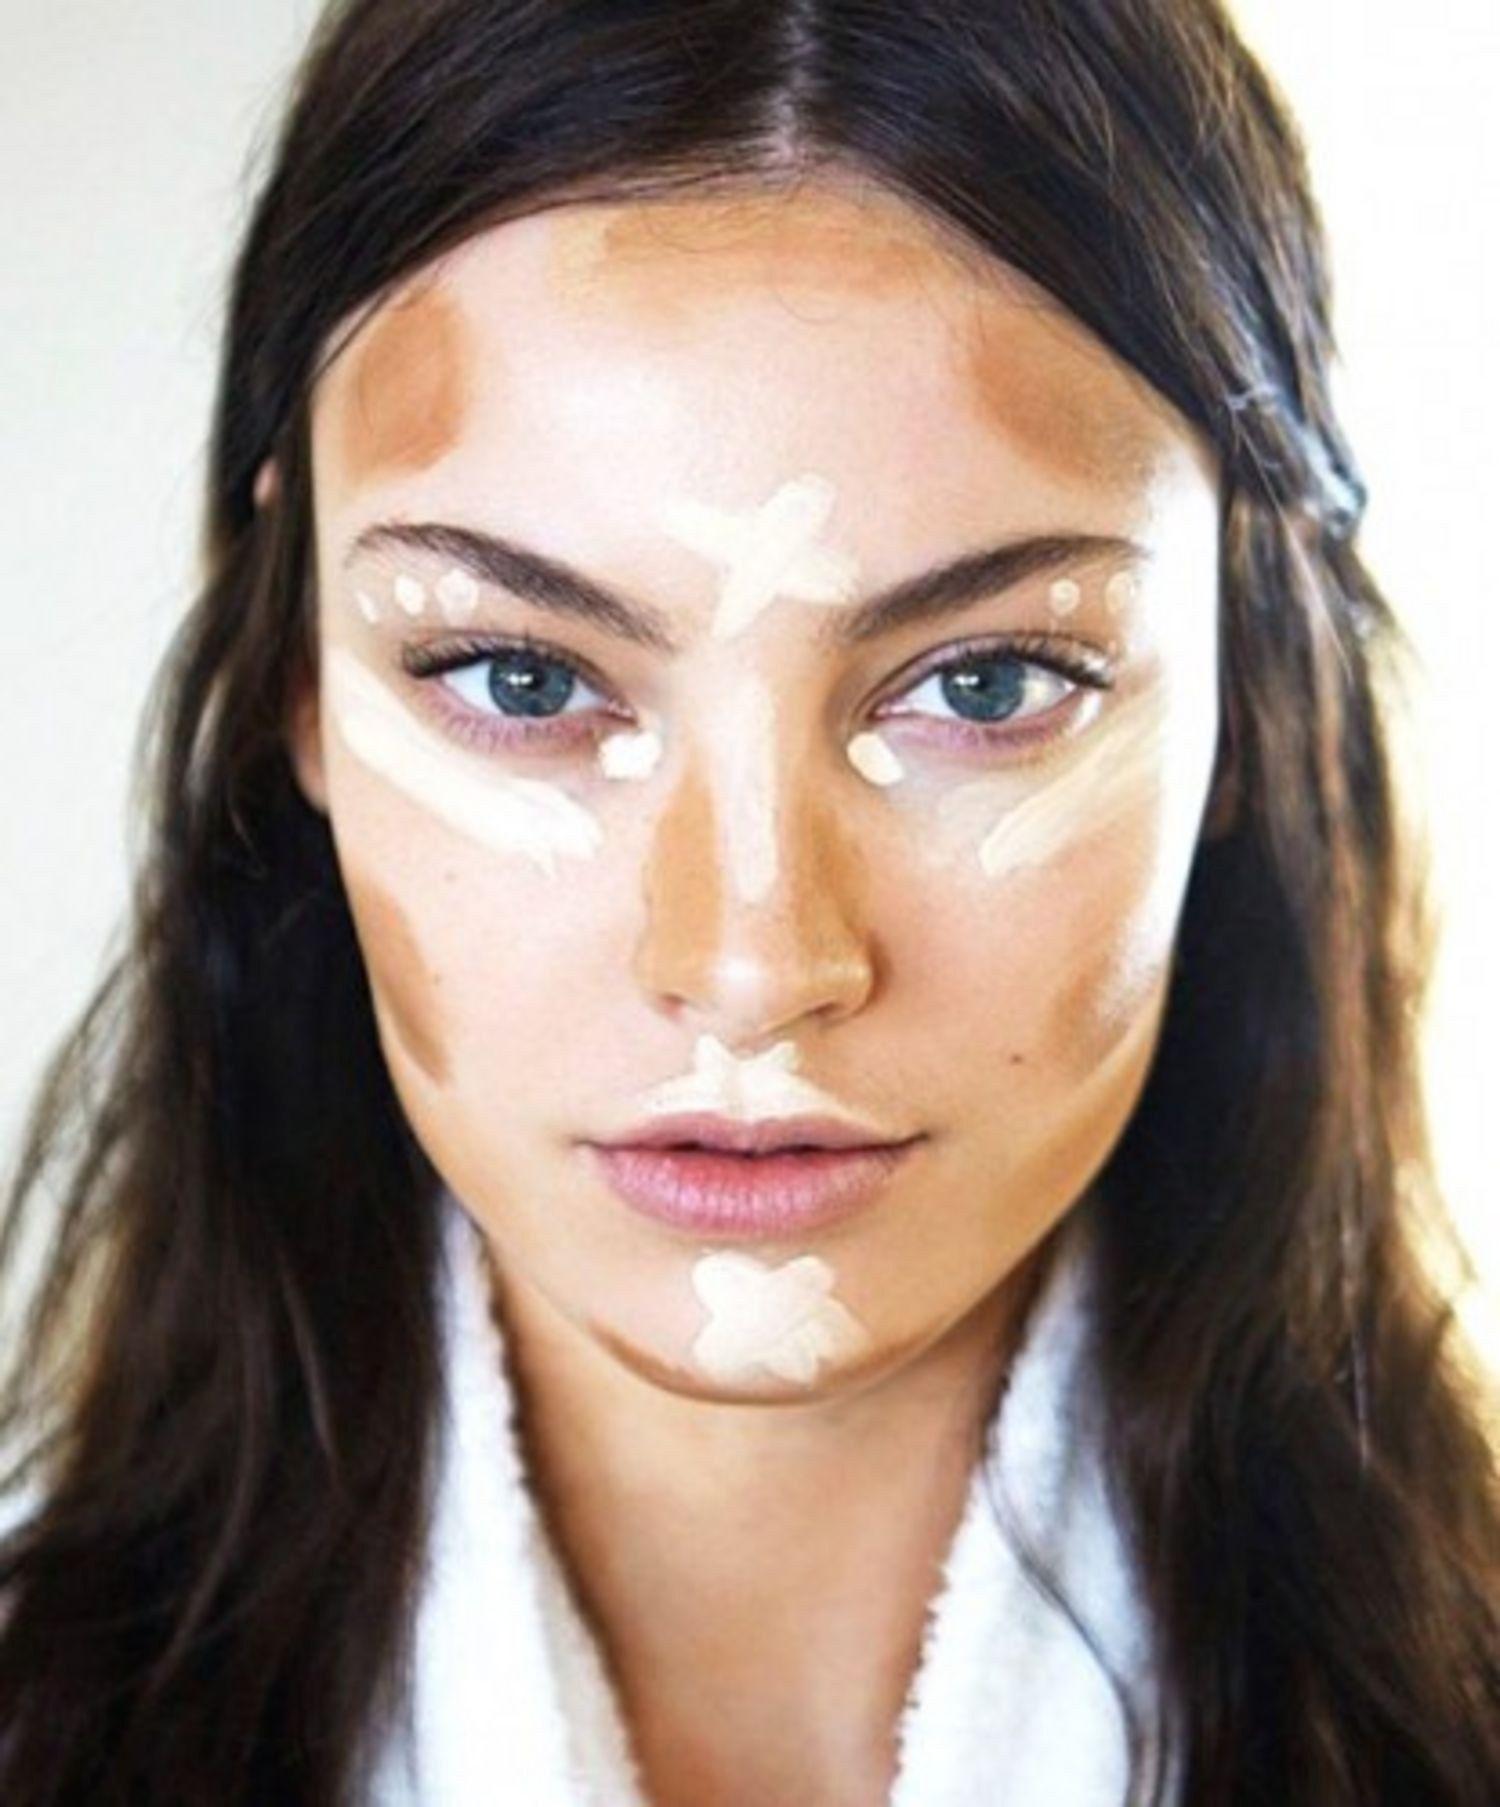 Why Bobbi Brown Thinks You Should Skip One Major Makeup Trend